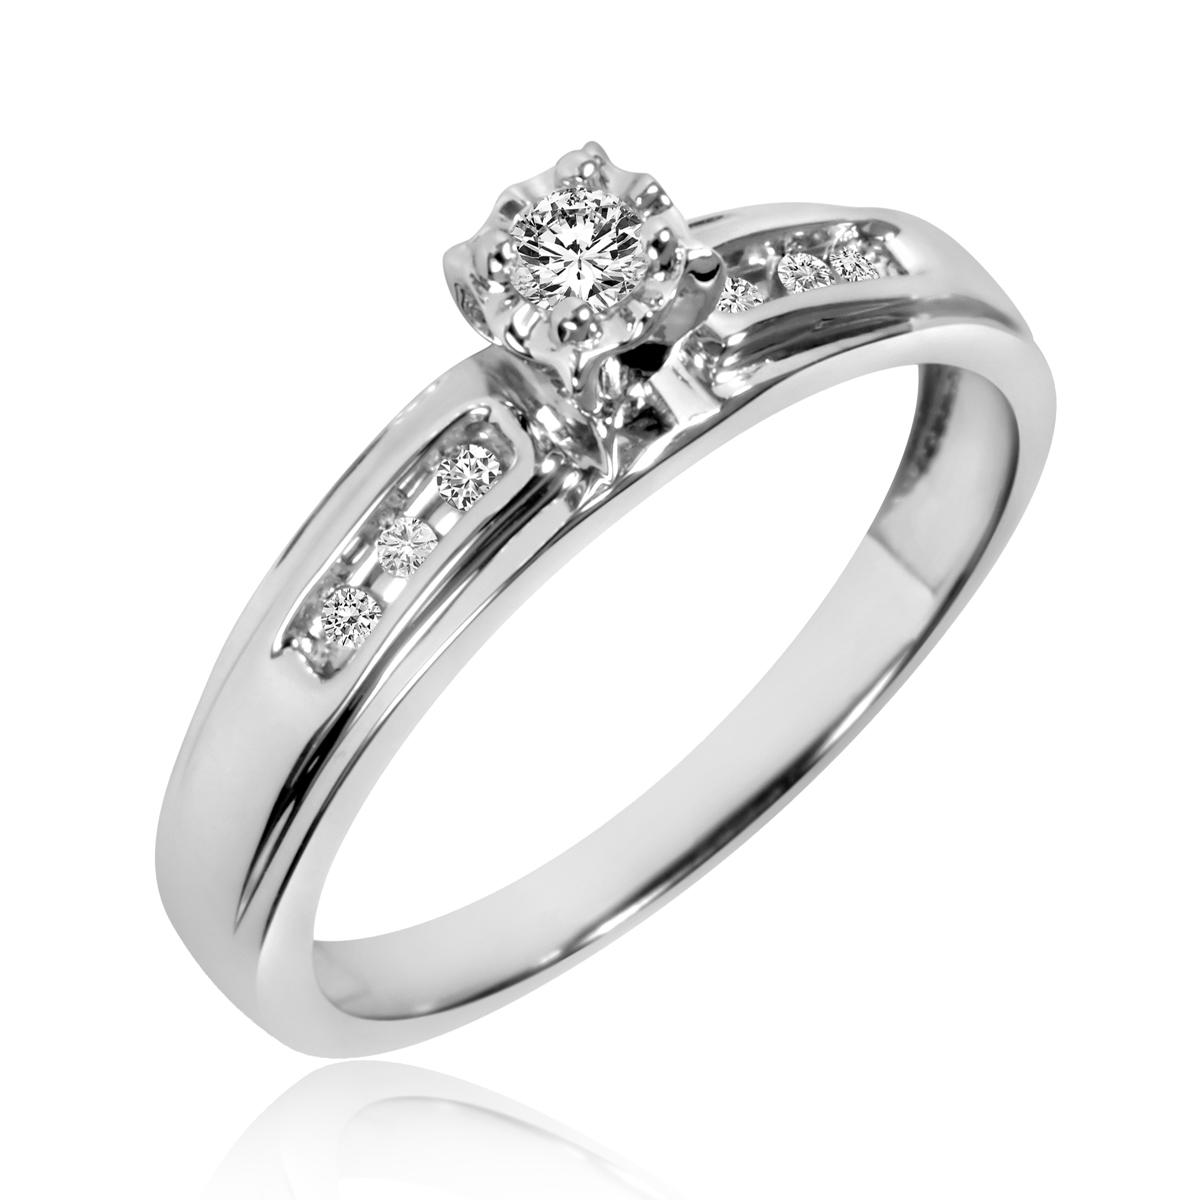 1/8 Carat T.W. Round Cut Diamond Ladies Engagement Ring 14K White Gold- Size 8